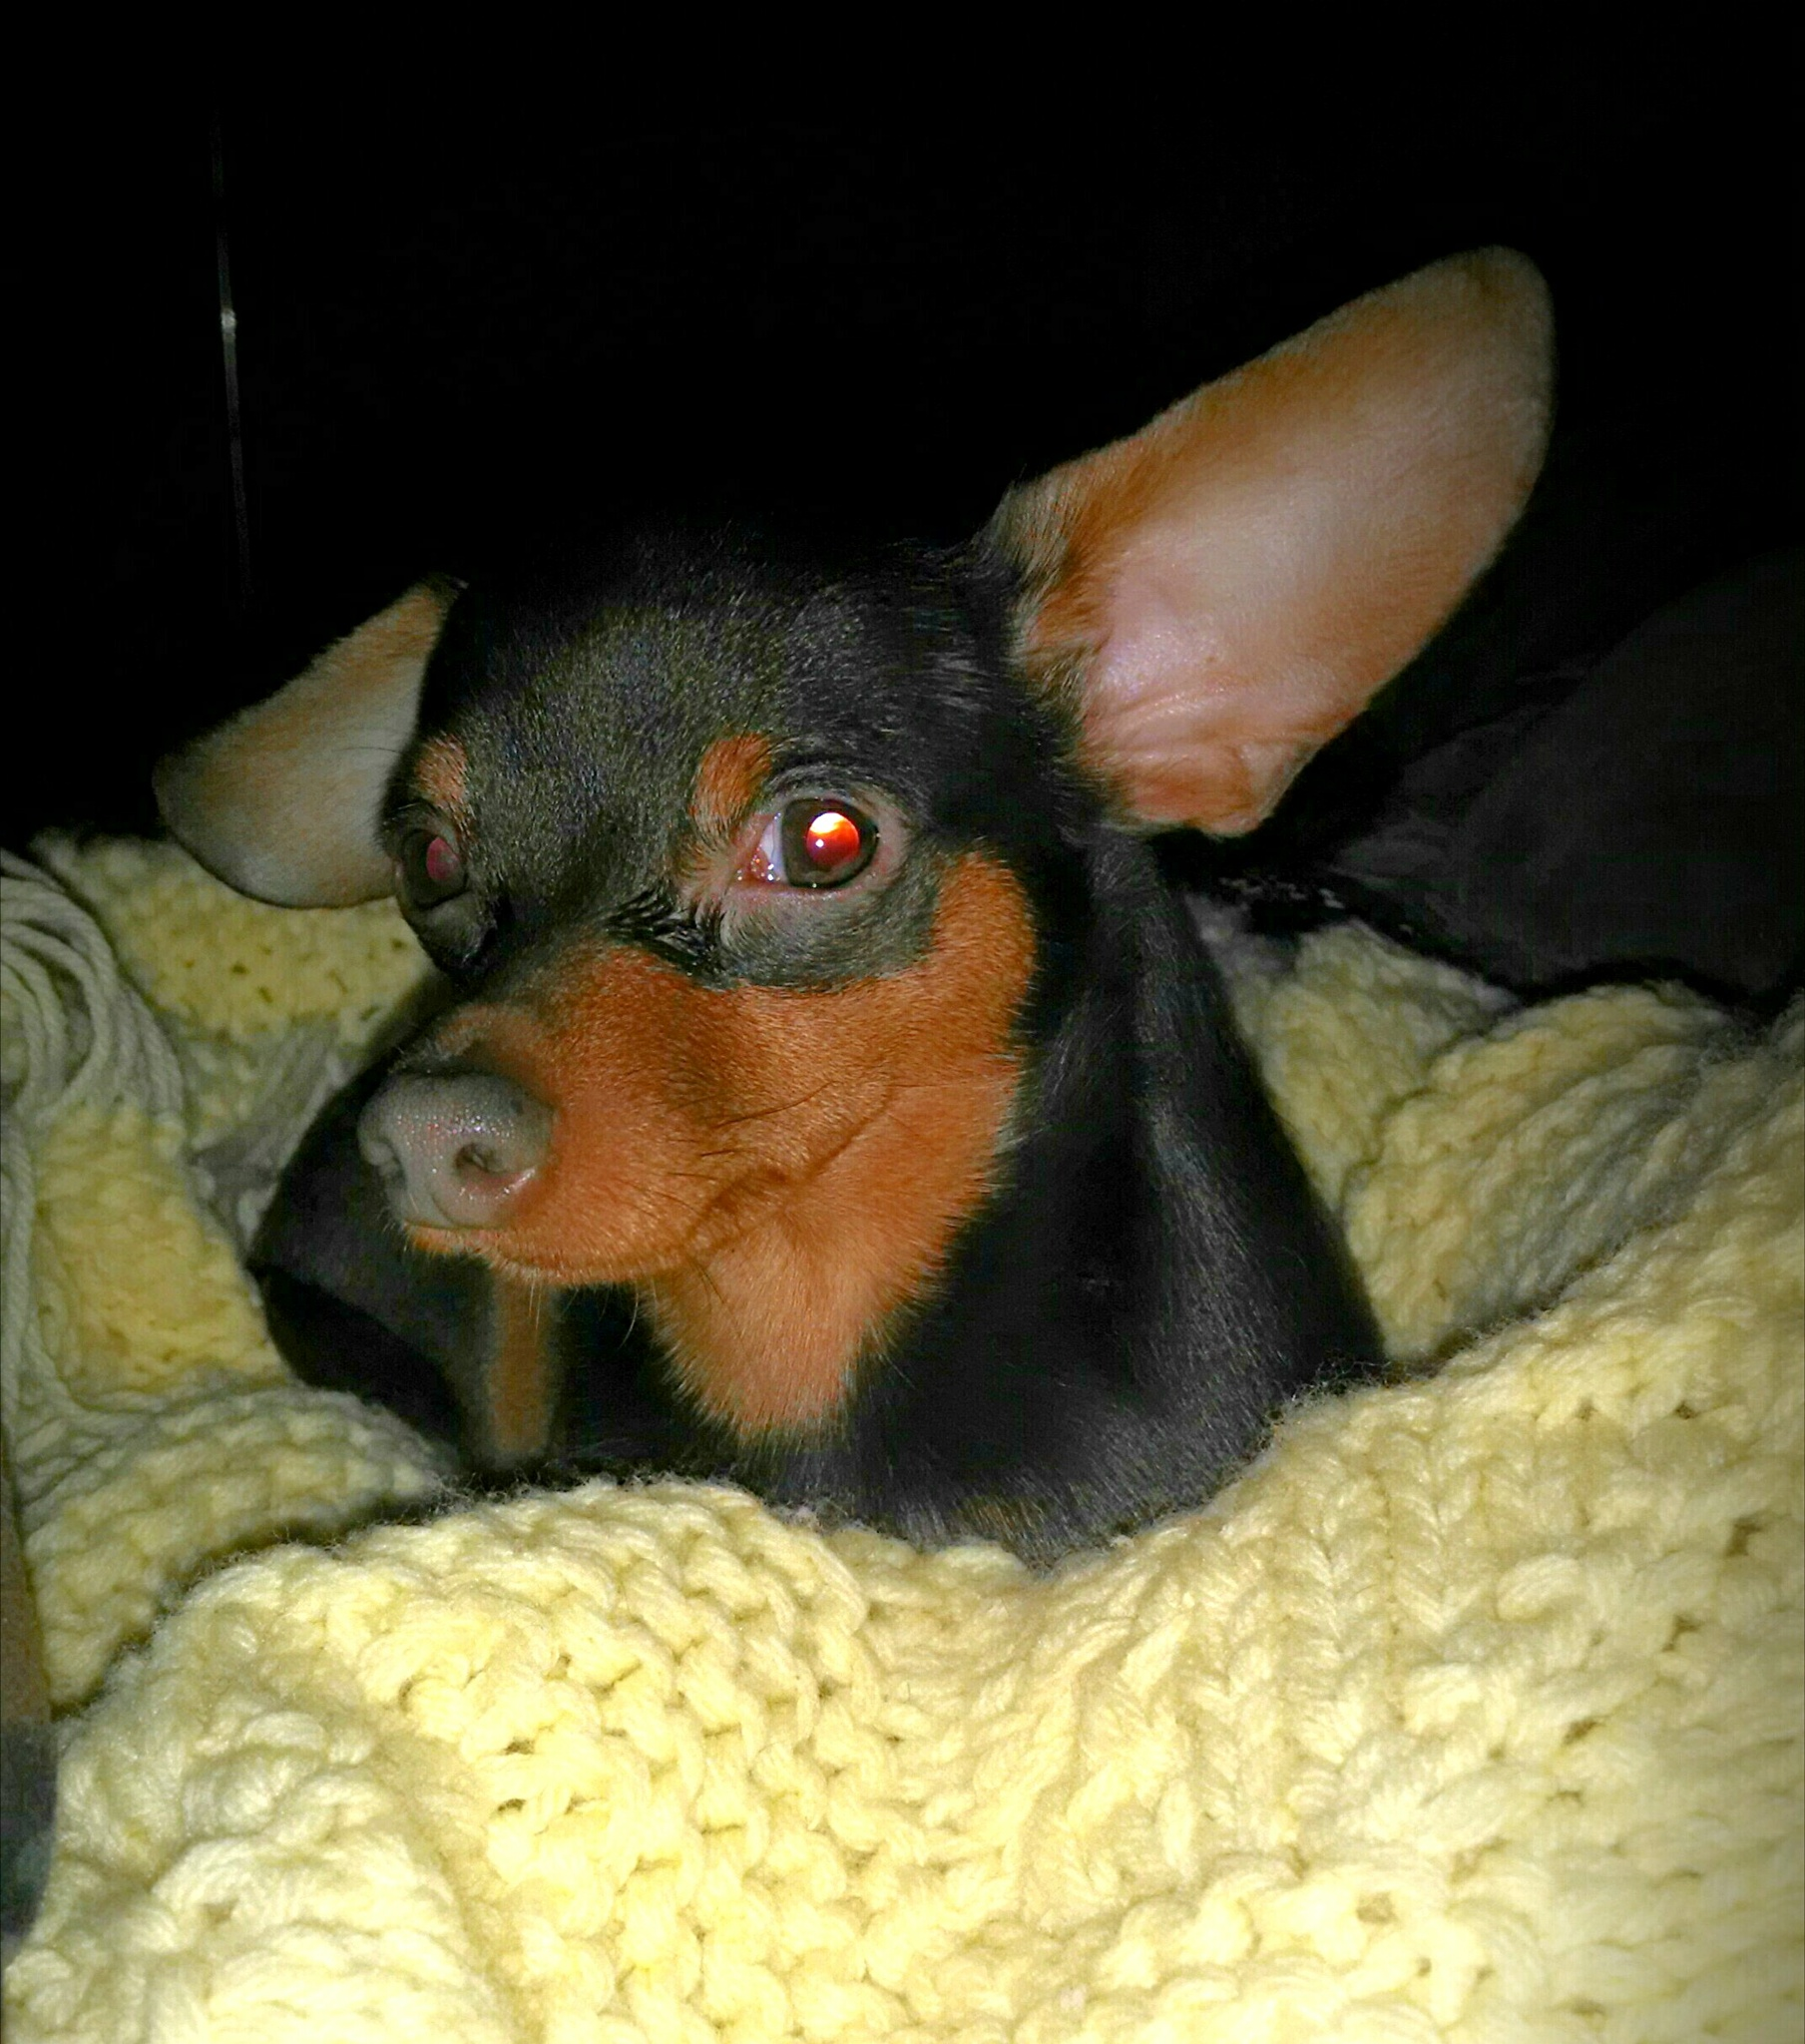 My lil dog by Angela Roark aka Raven Isaboe Wolfe